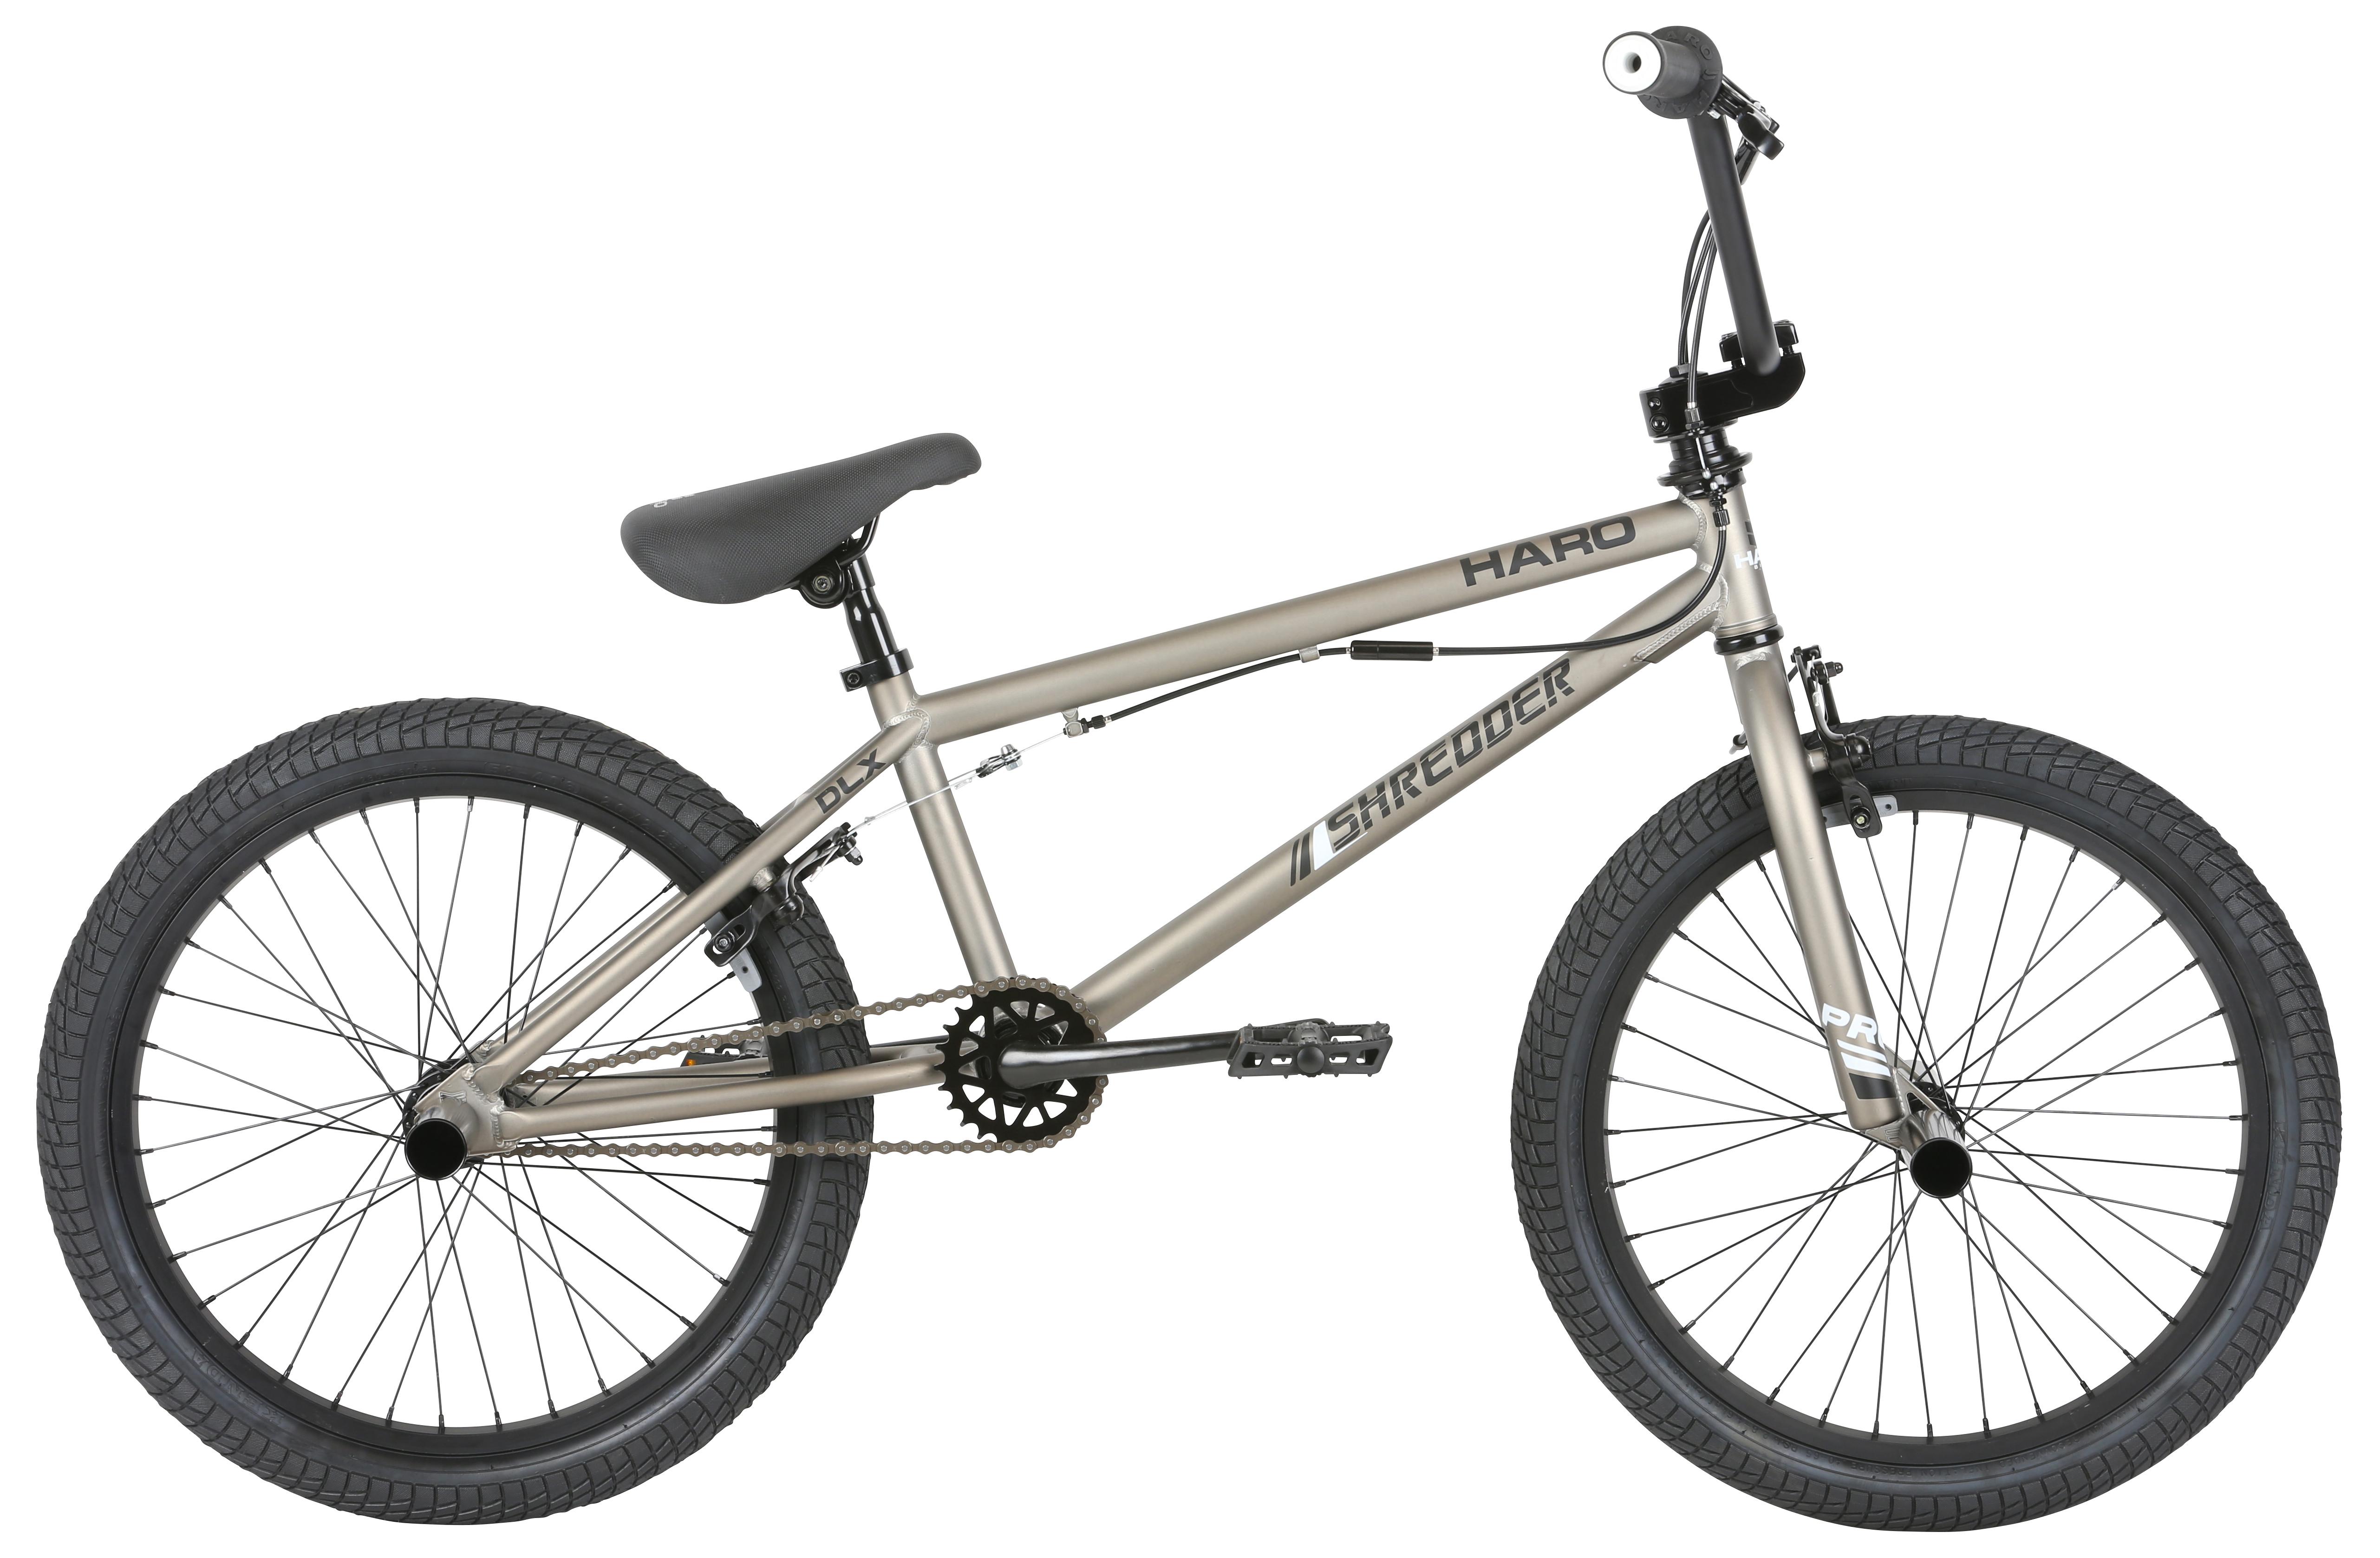 Велосипед Haro Shredder Pro DLX 20 2019 цена